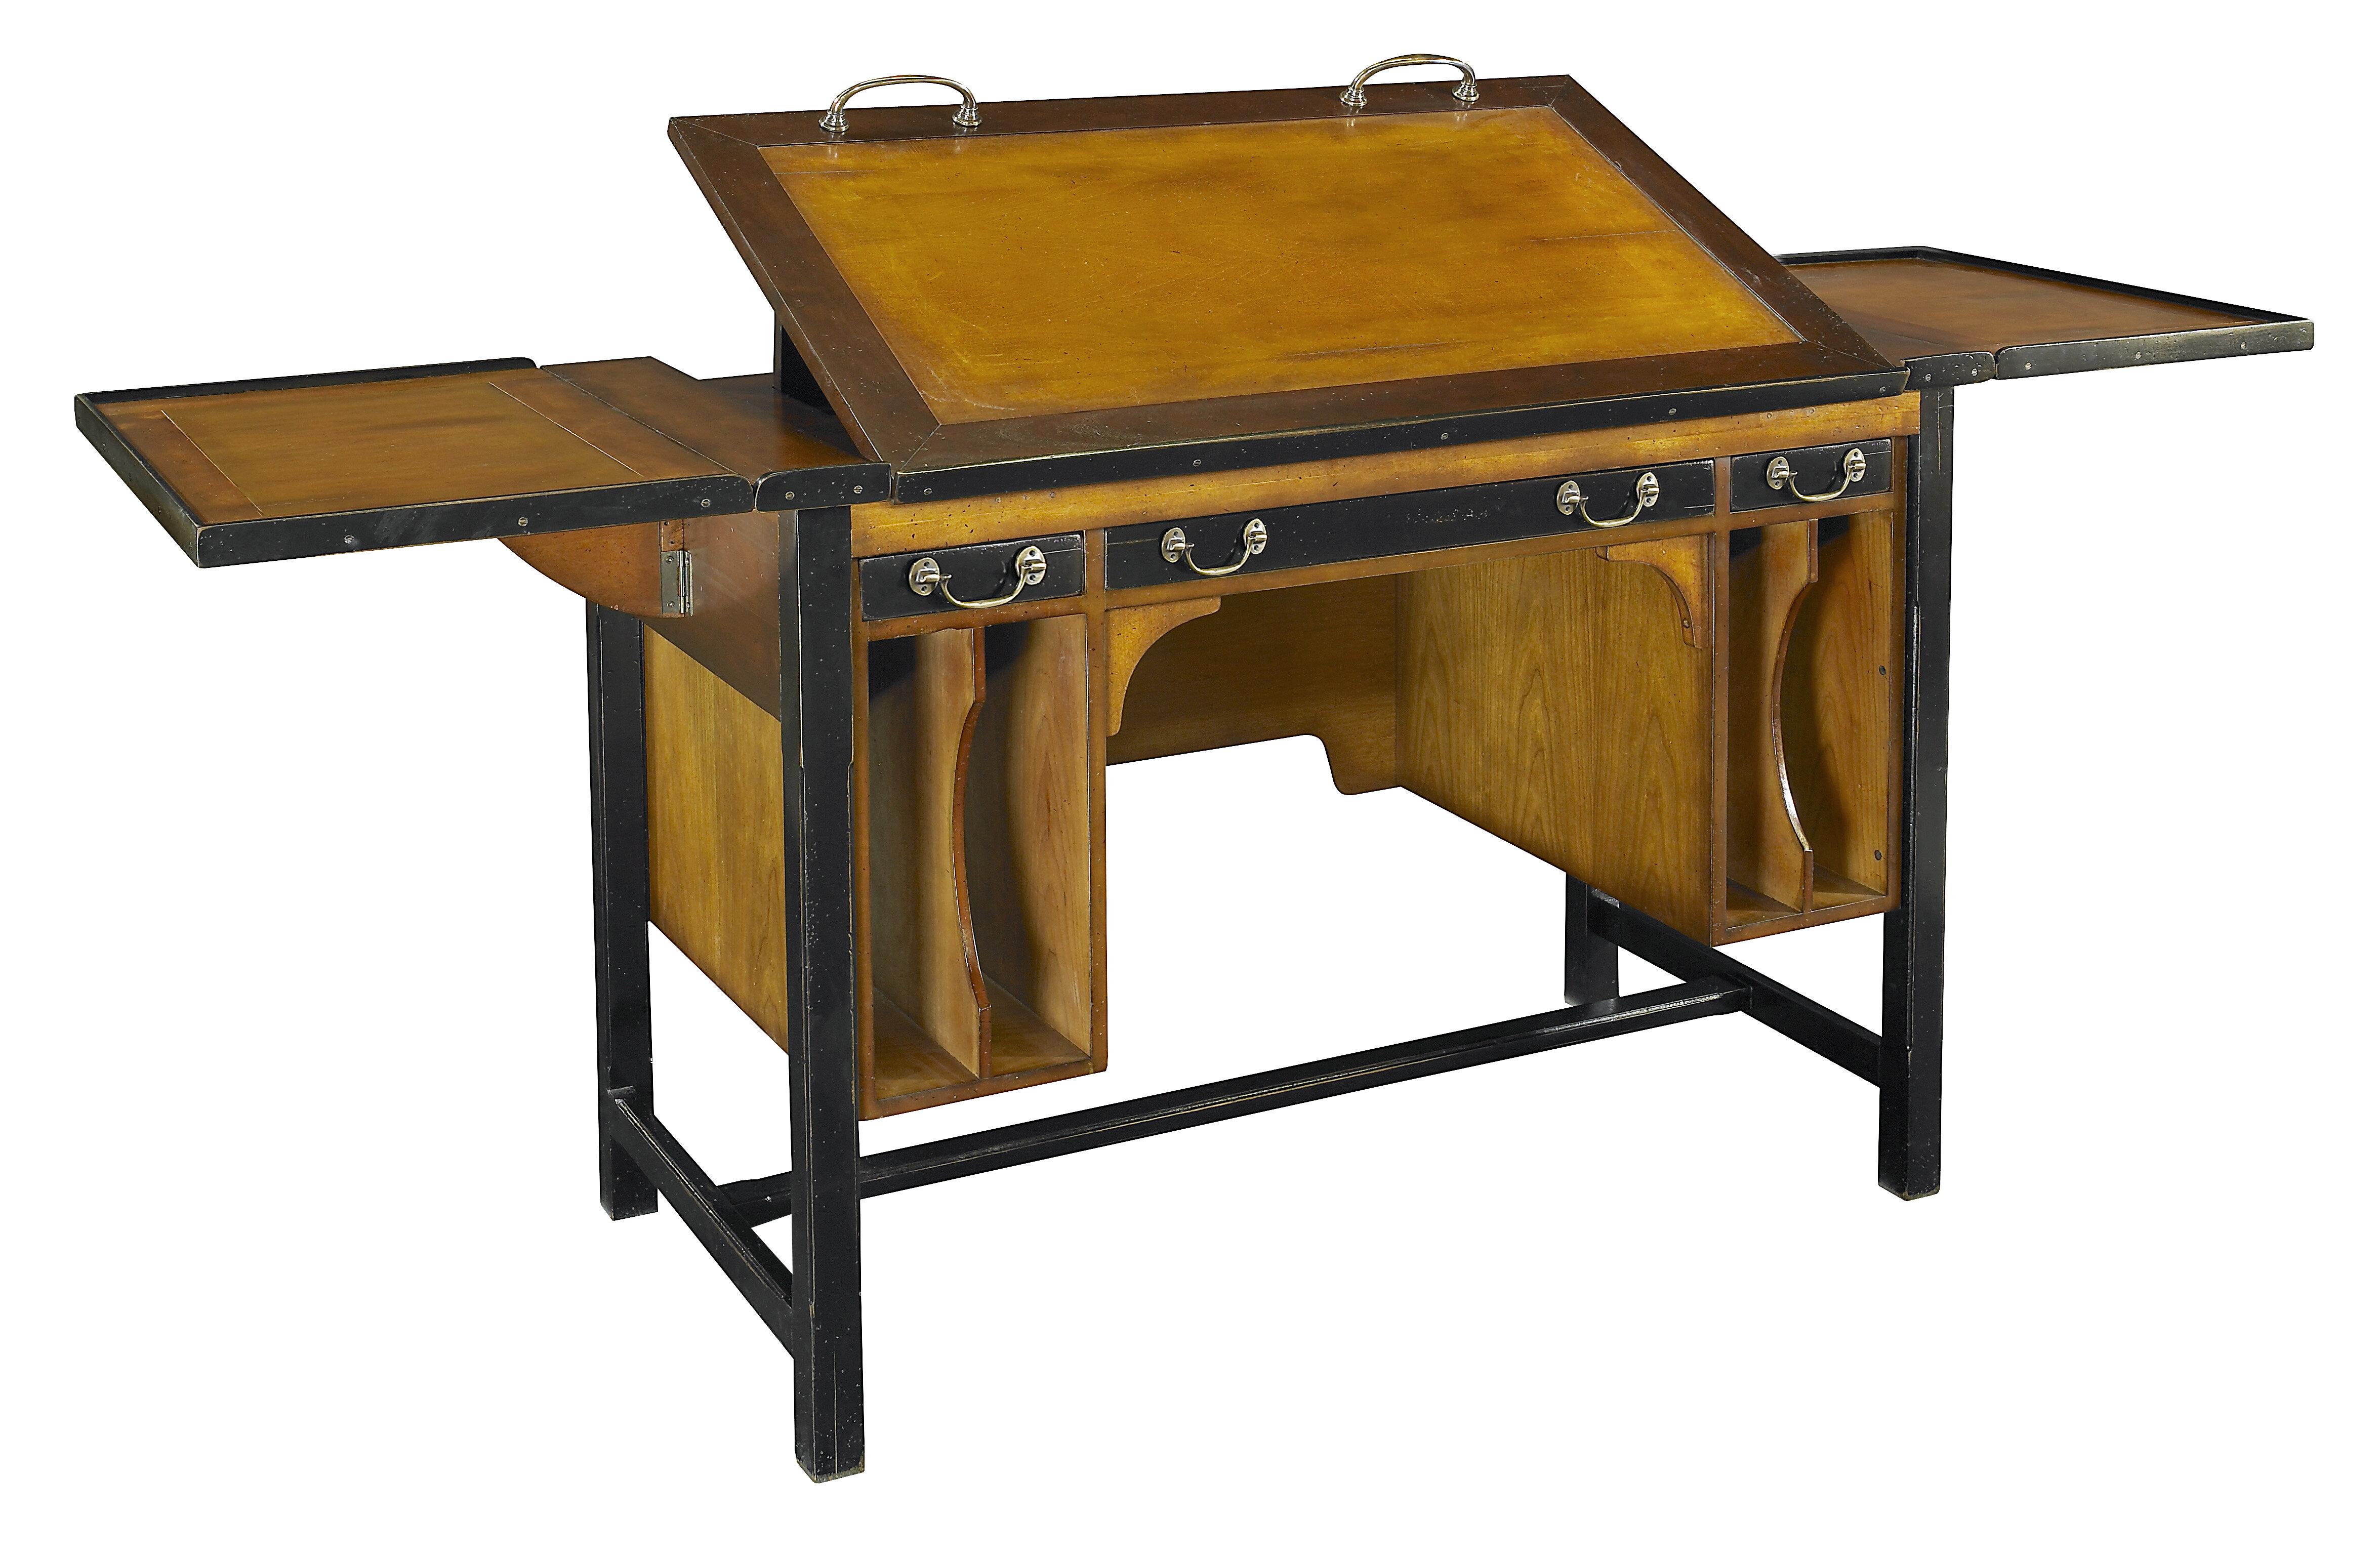 Authentic Models Bureau Architect Drafting Table | Wayfair